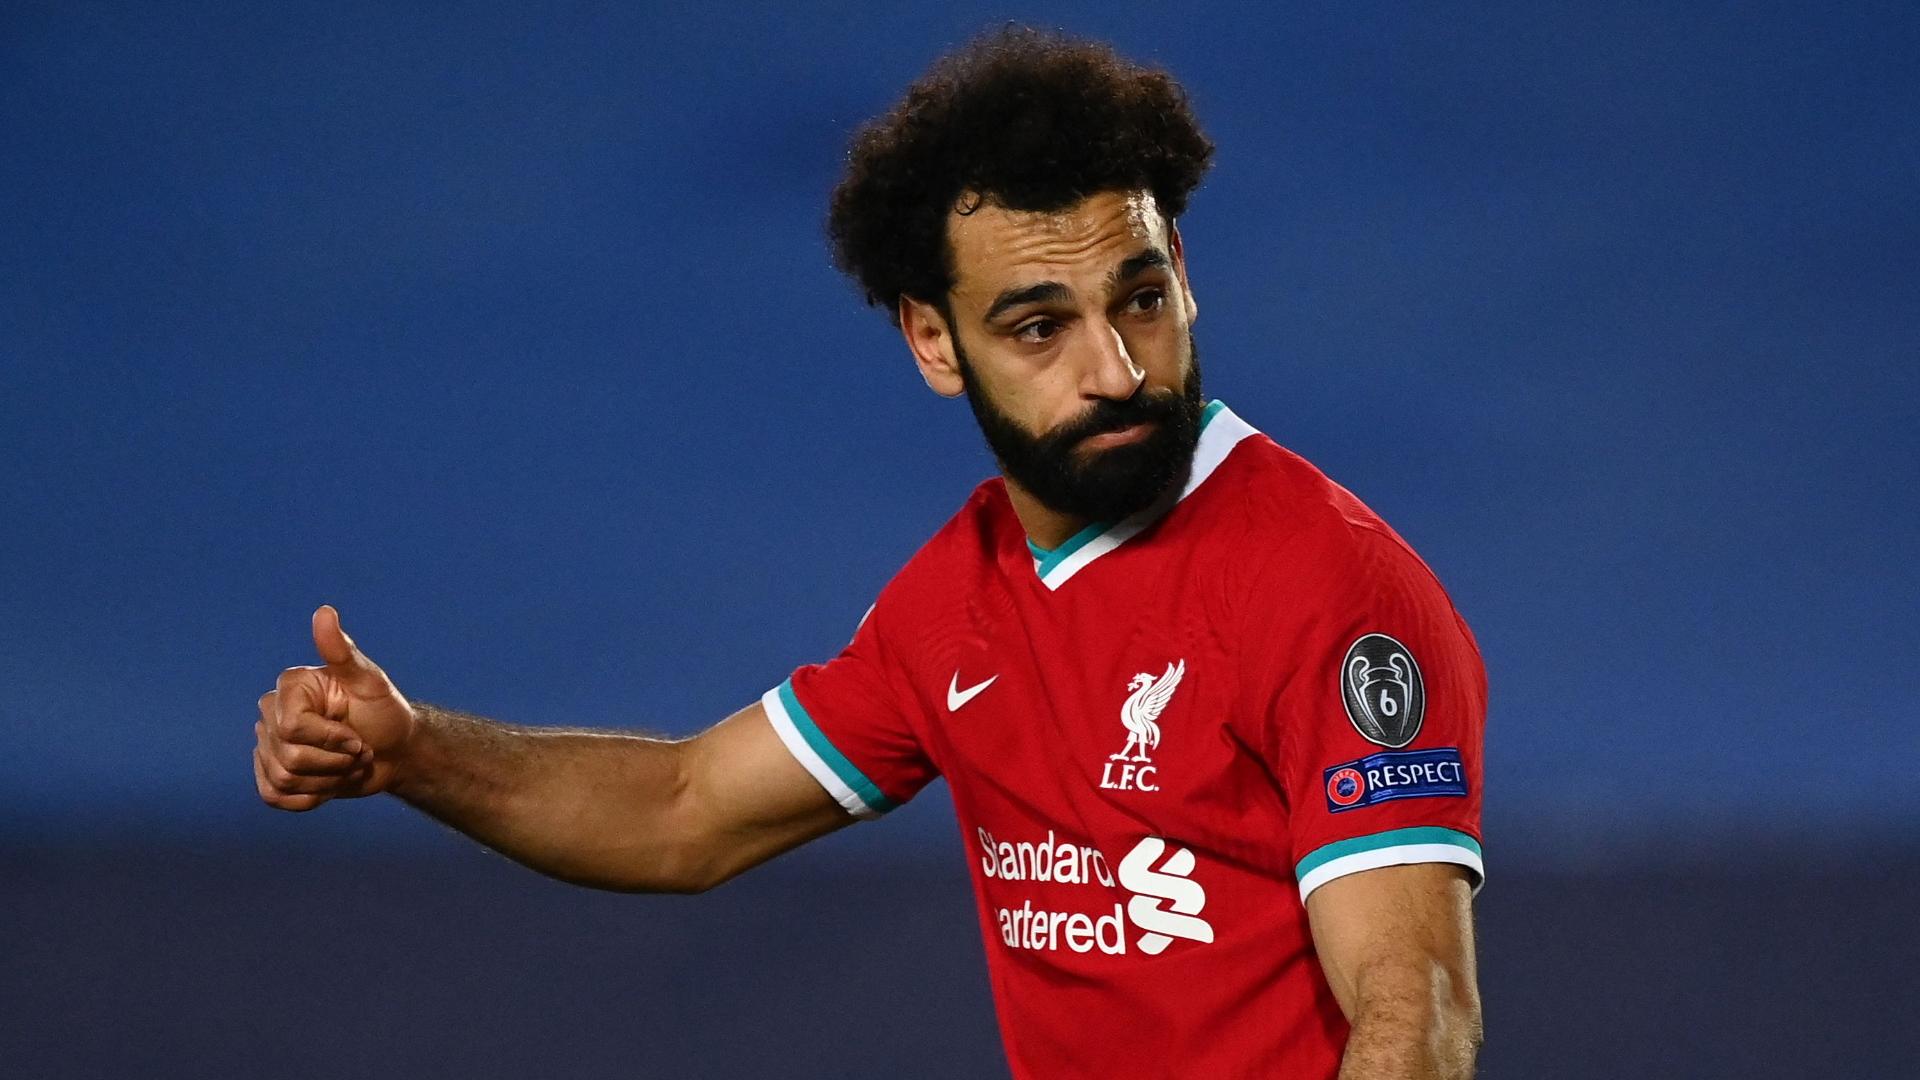 Shaaban: Why Salah should stay at Liverpool